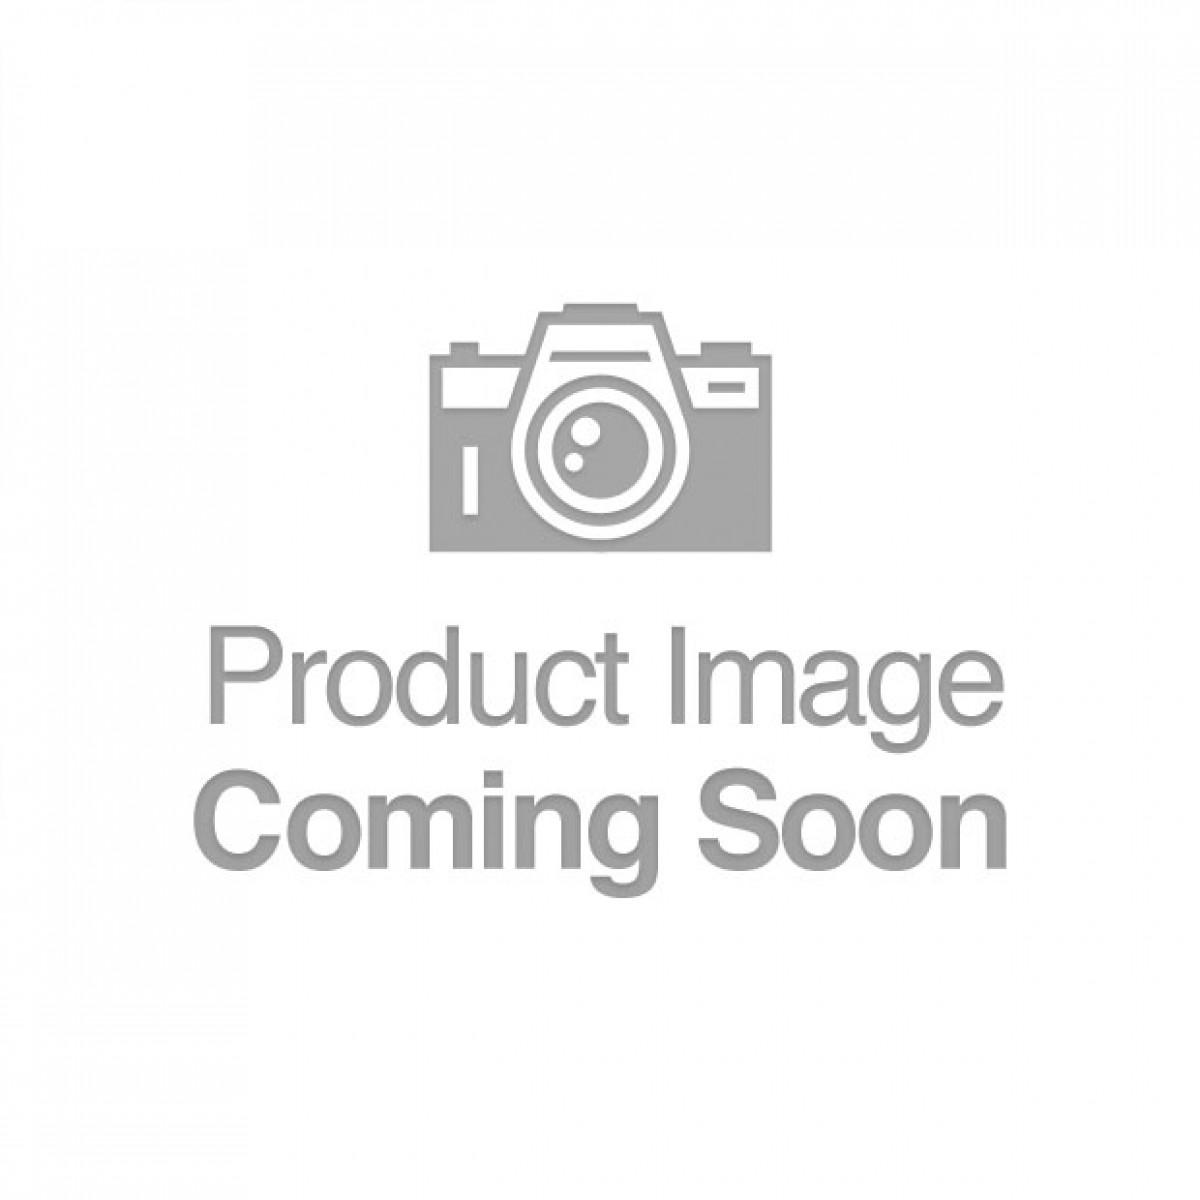 Alpha Pro 7x P-Gyro Prostate Stimulator w/Rotating Shaft - Black